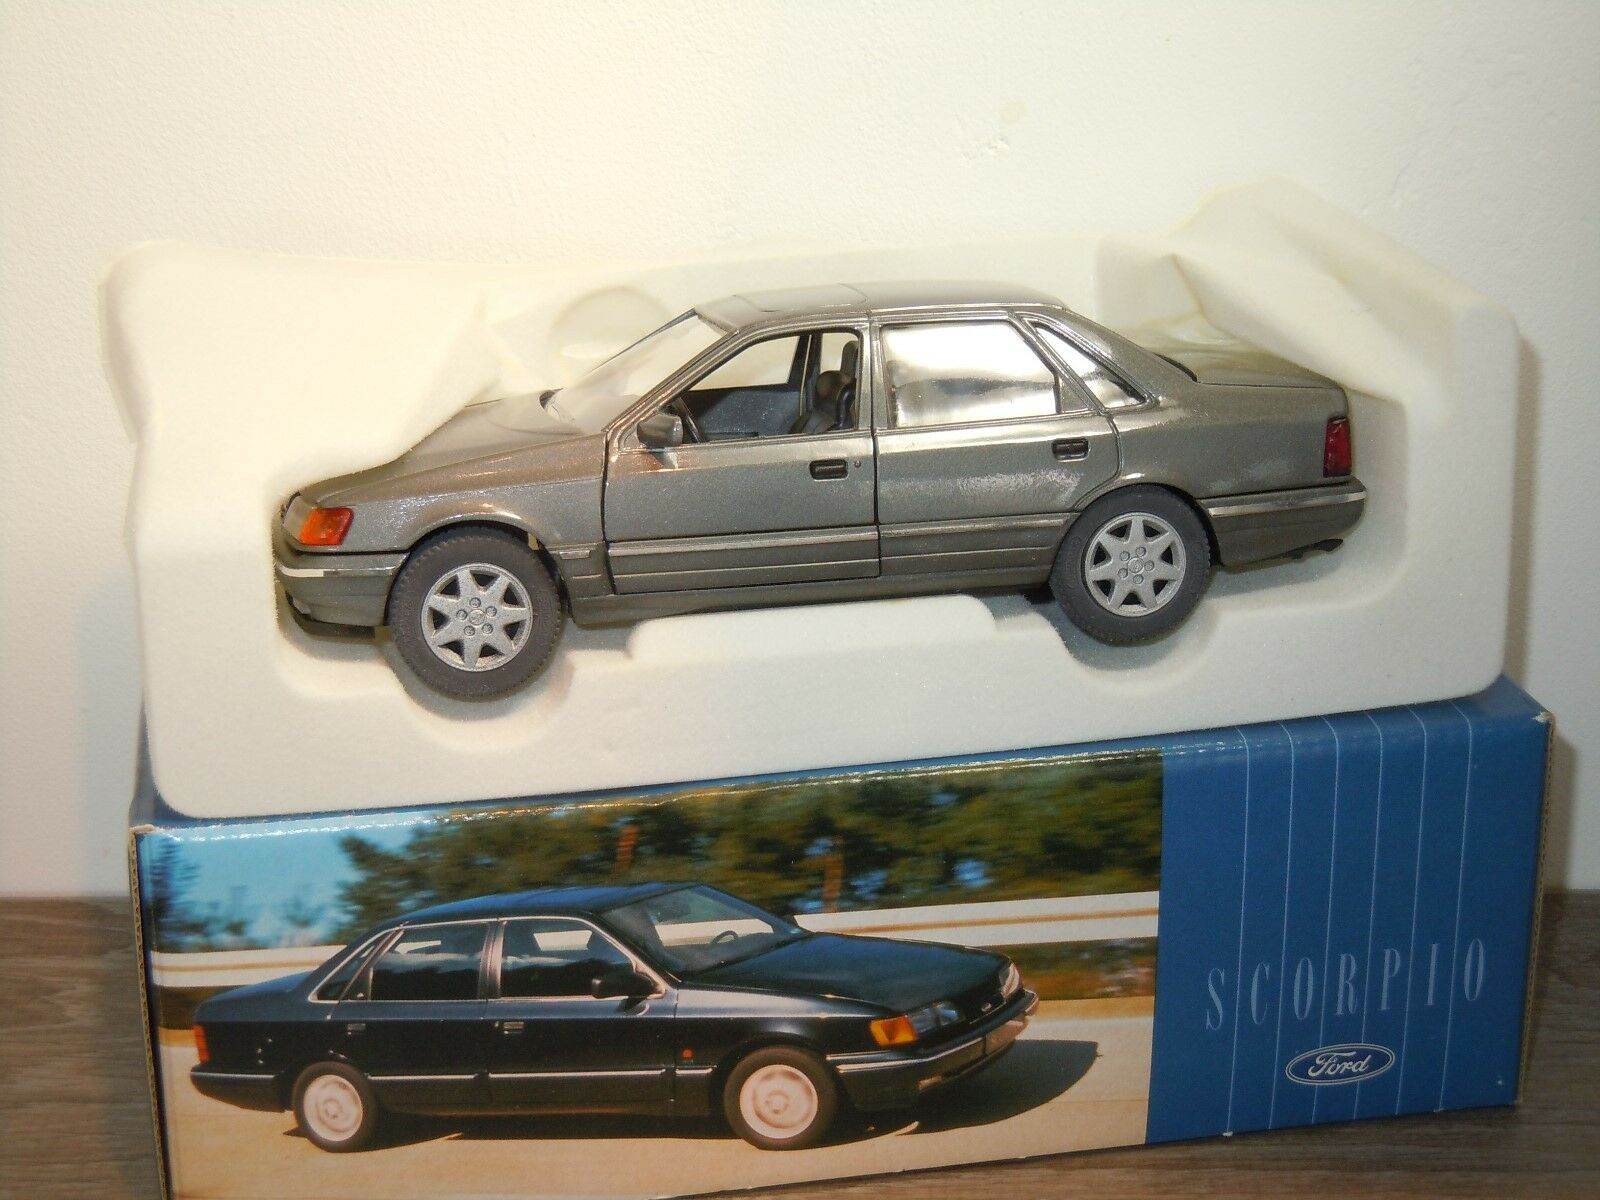 tienda de bajo costo Ford Scorpio Saloon - - - Schabak 1503 Germany 1 25 in Box 33170  Venta barata